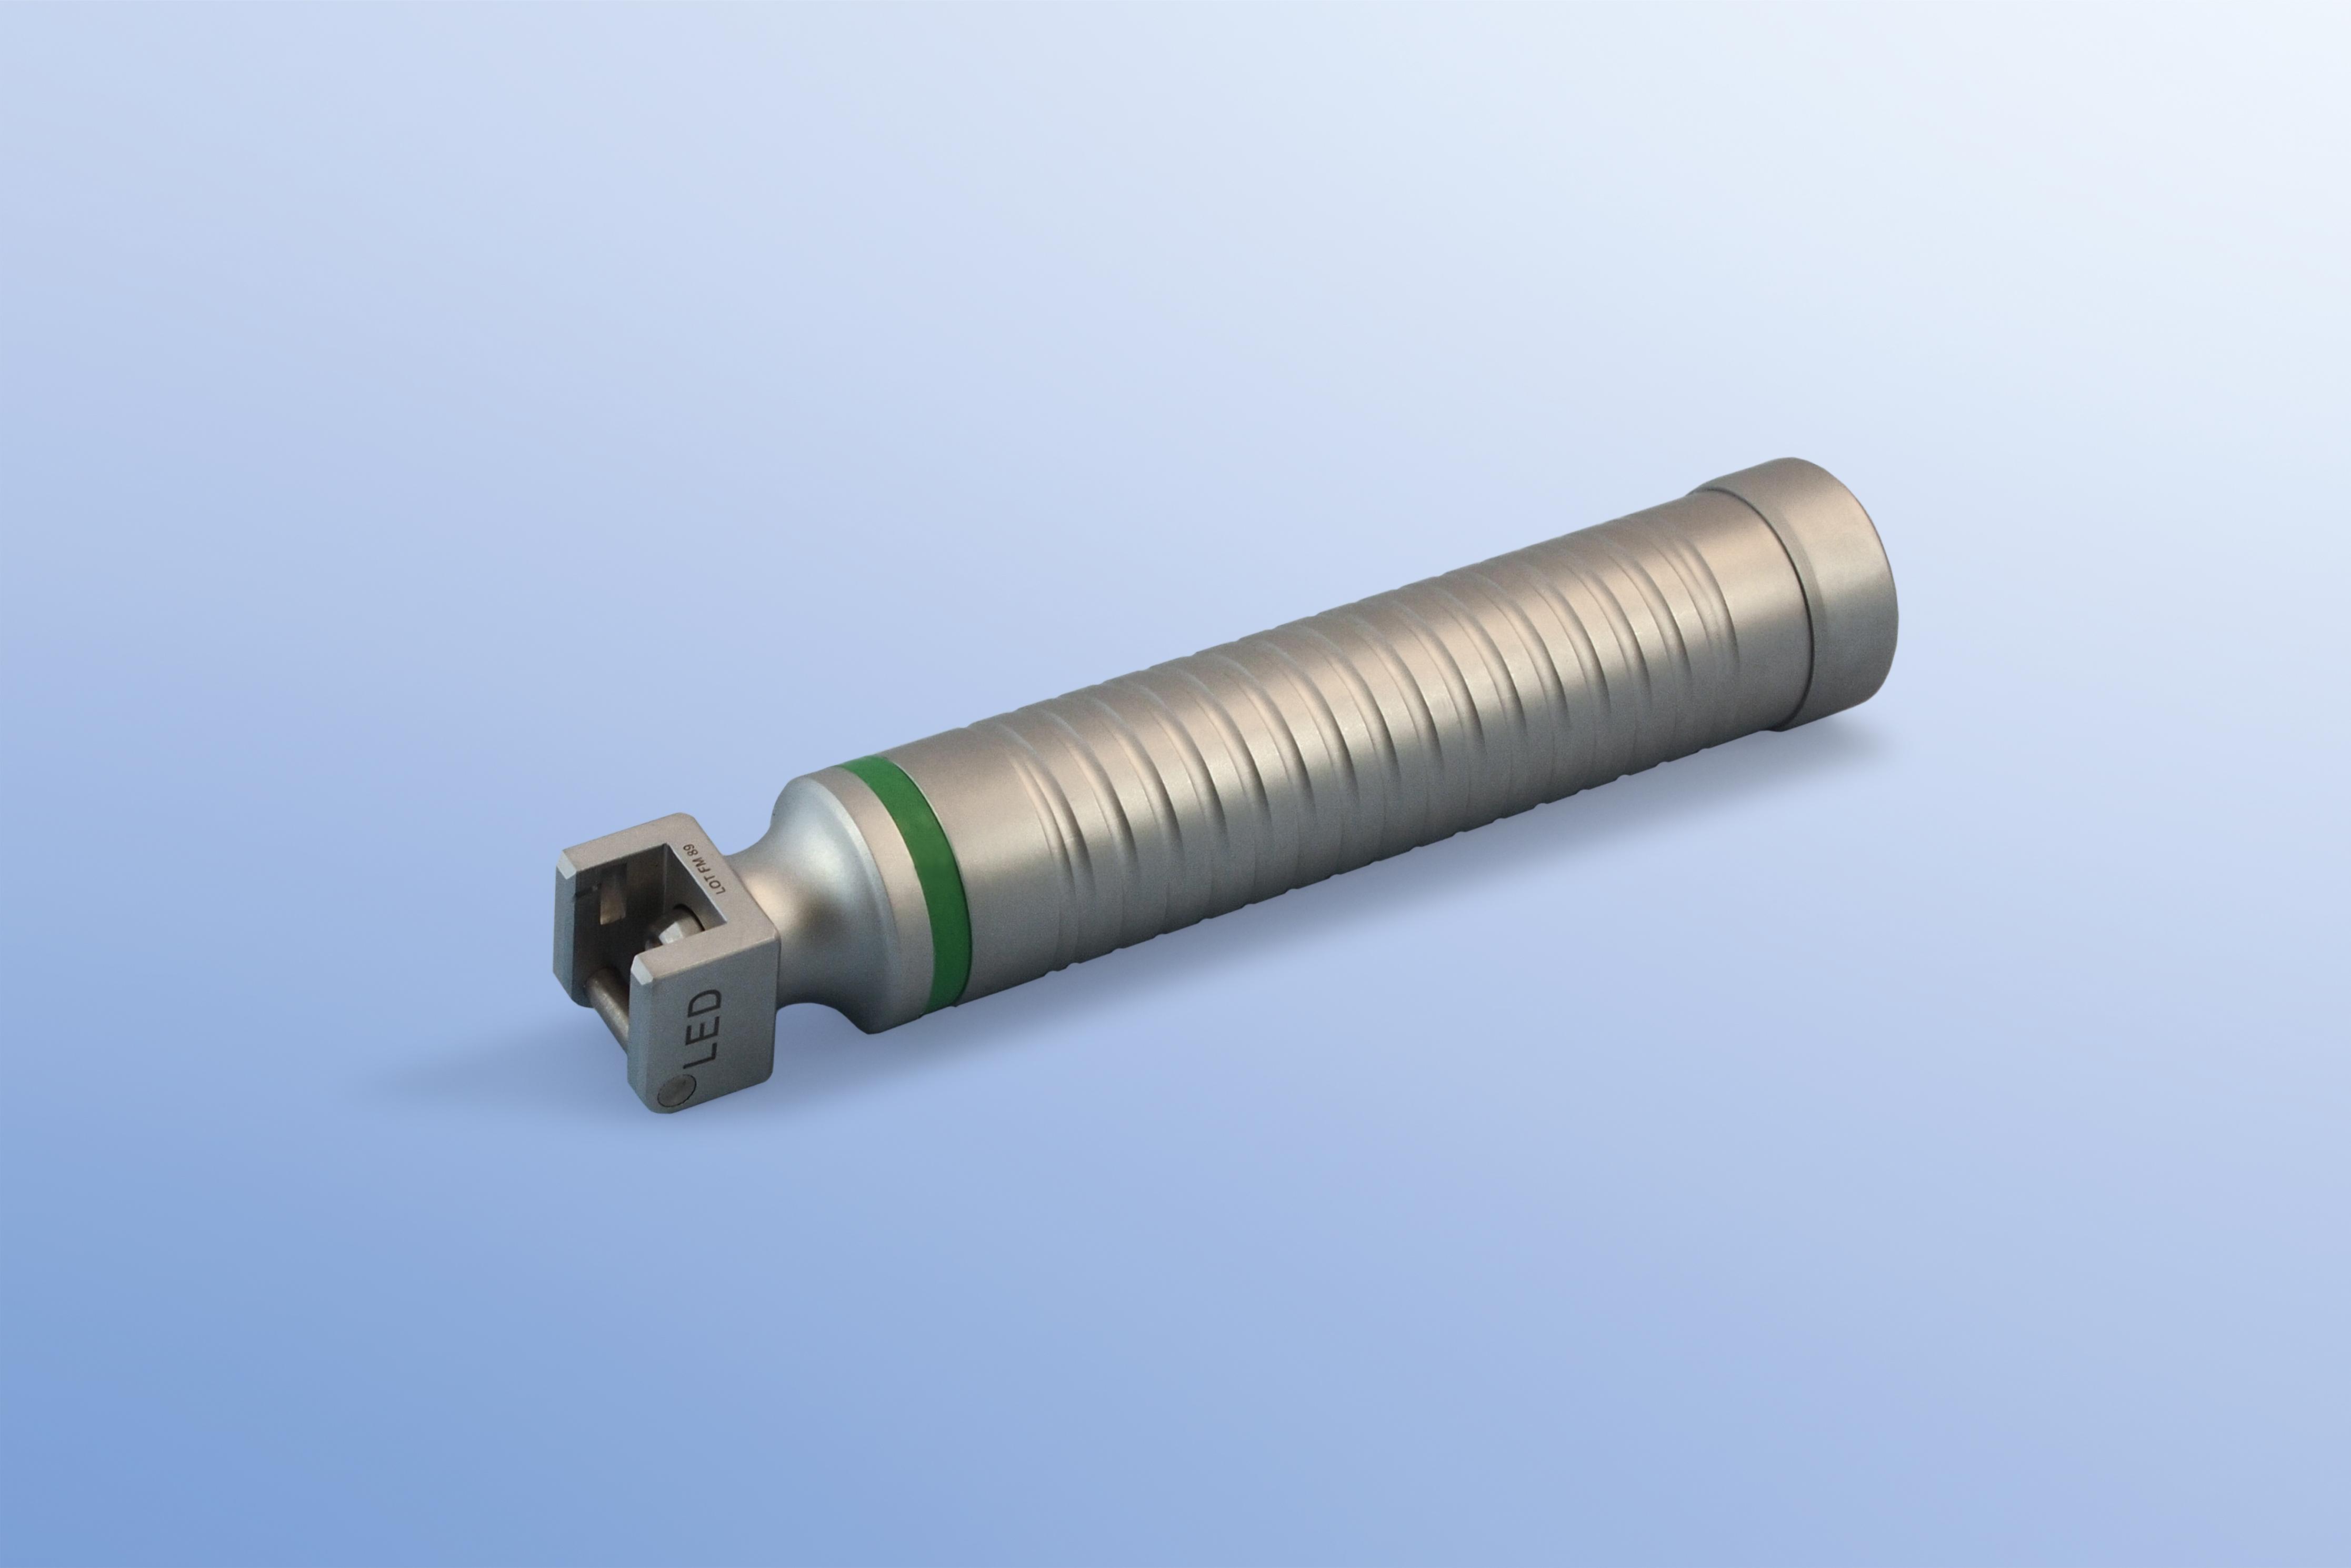 Laryngoskop-Griff mit Batterie, LED, Erwachsener